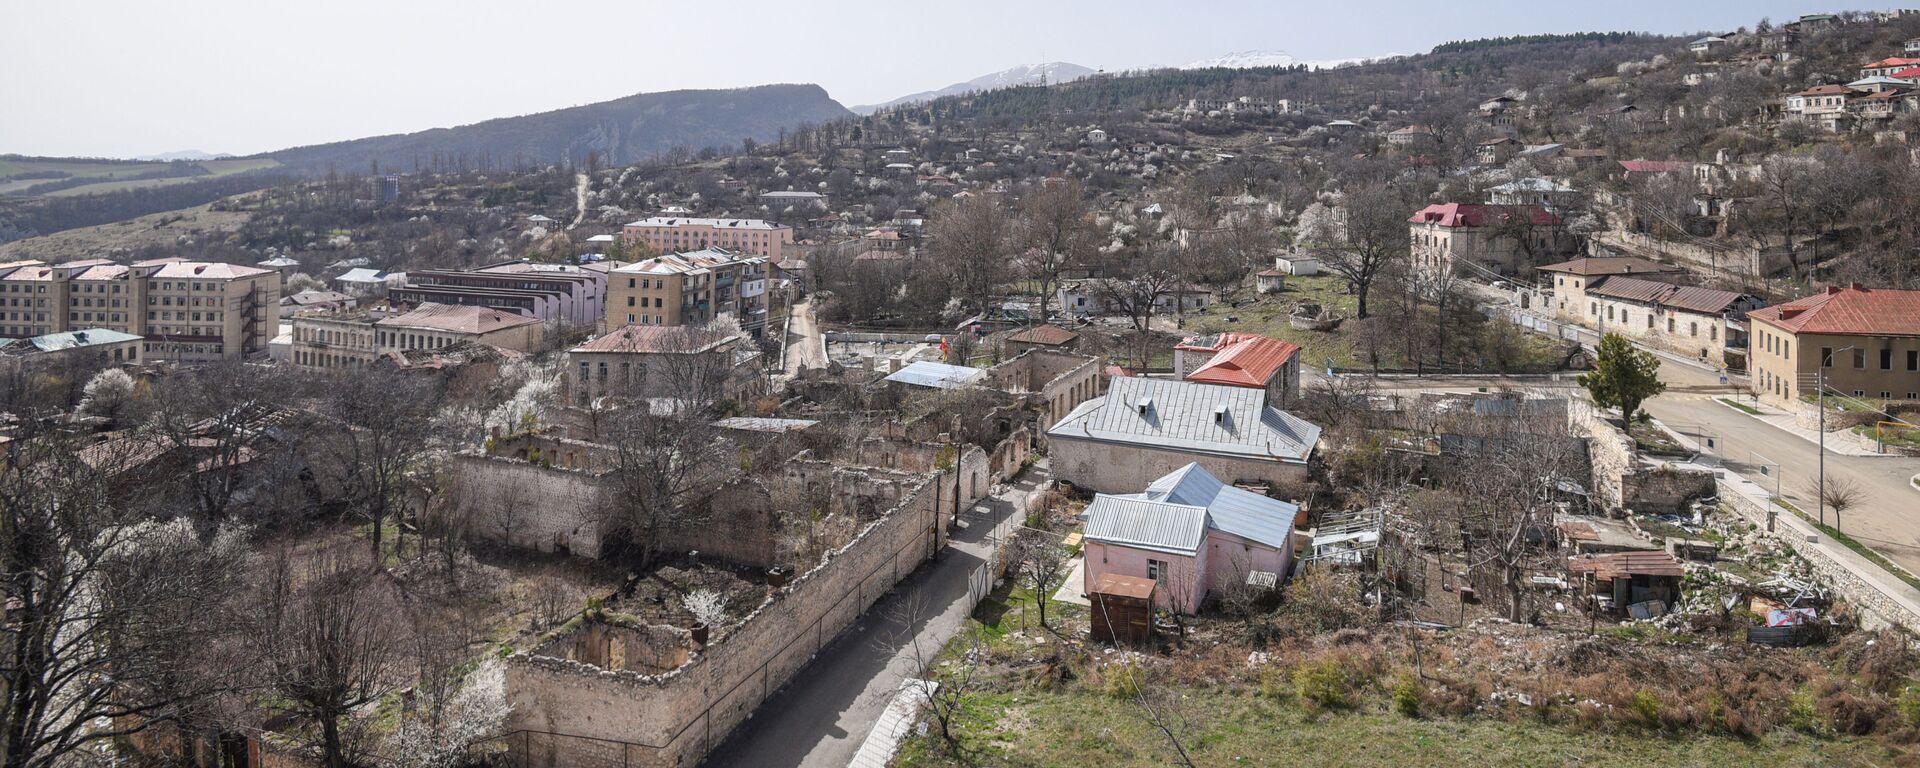 Вид на город Шуша, фото из архива - Sputnik Азербайджан, 1920, 21.09.2021